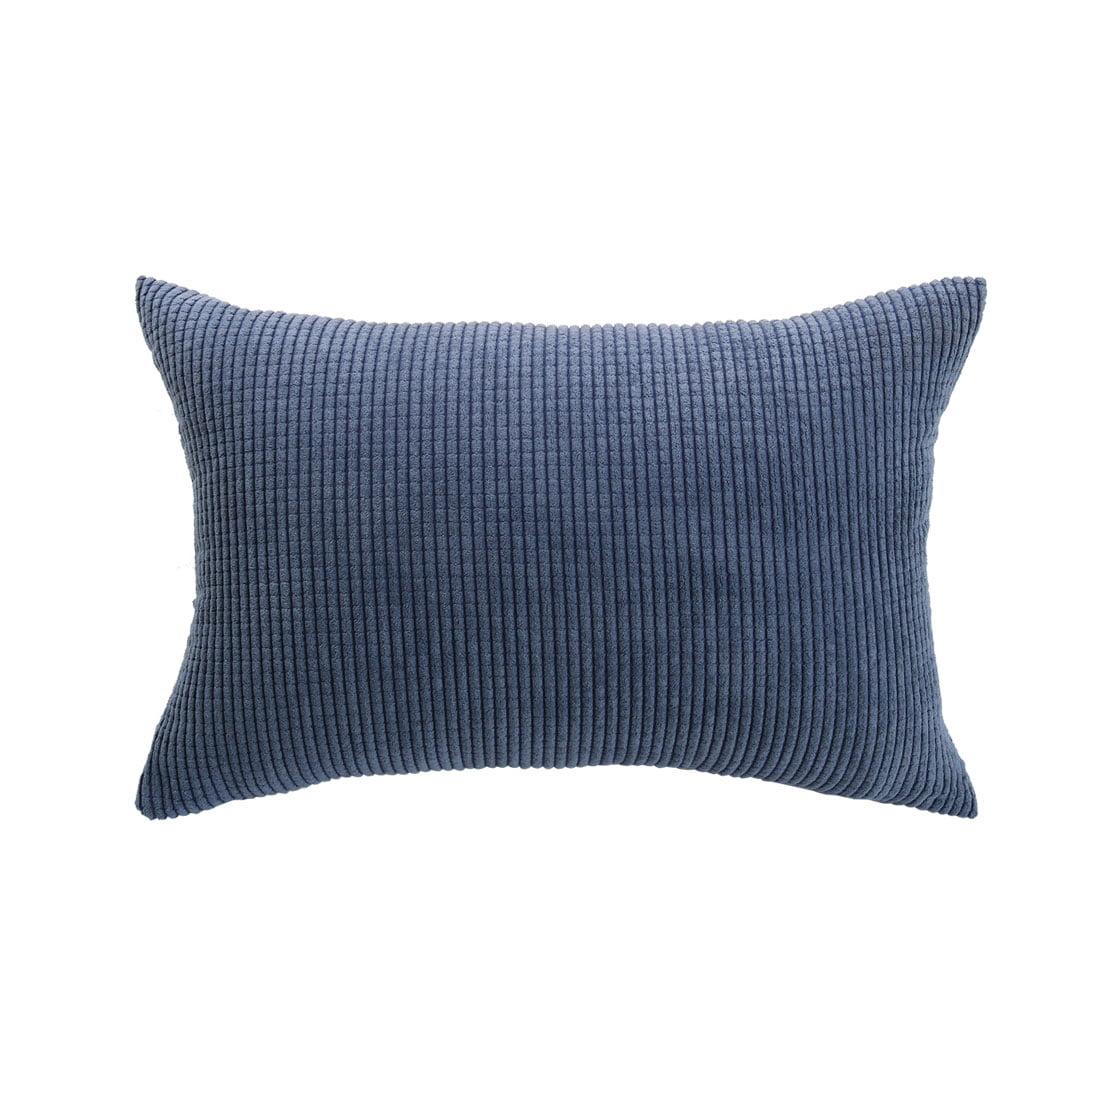 Throw Pillow Cover Velvet Cushion Cover Corduroy Pillow Case for Sofa